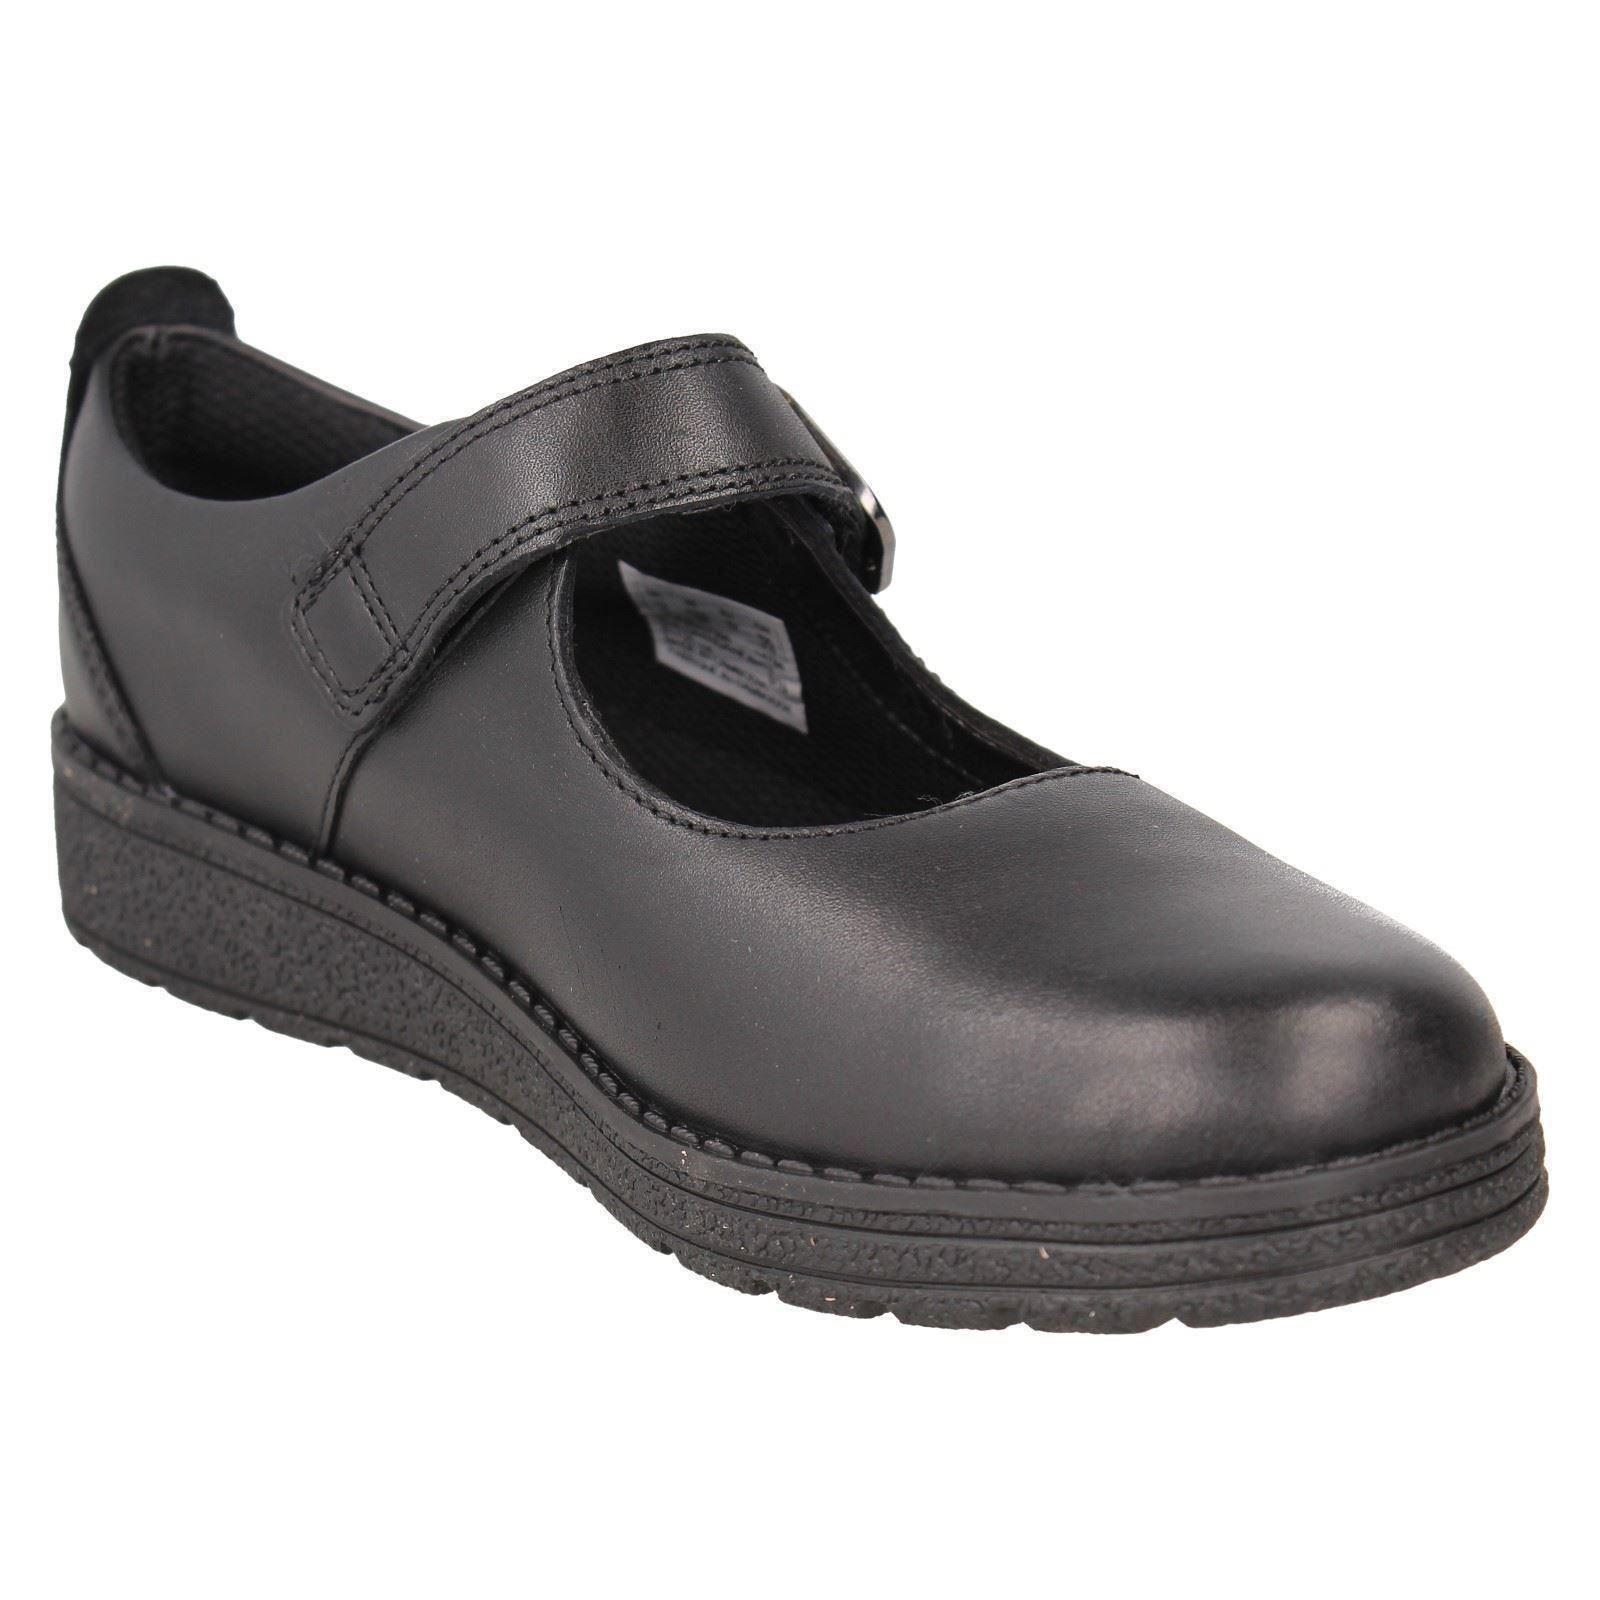 Girls Clarks School Shoes /'Daisy Gleam/'